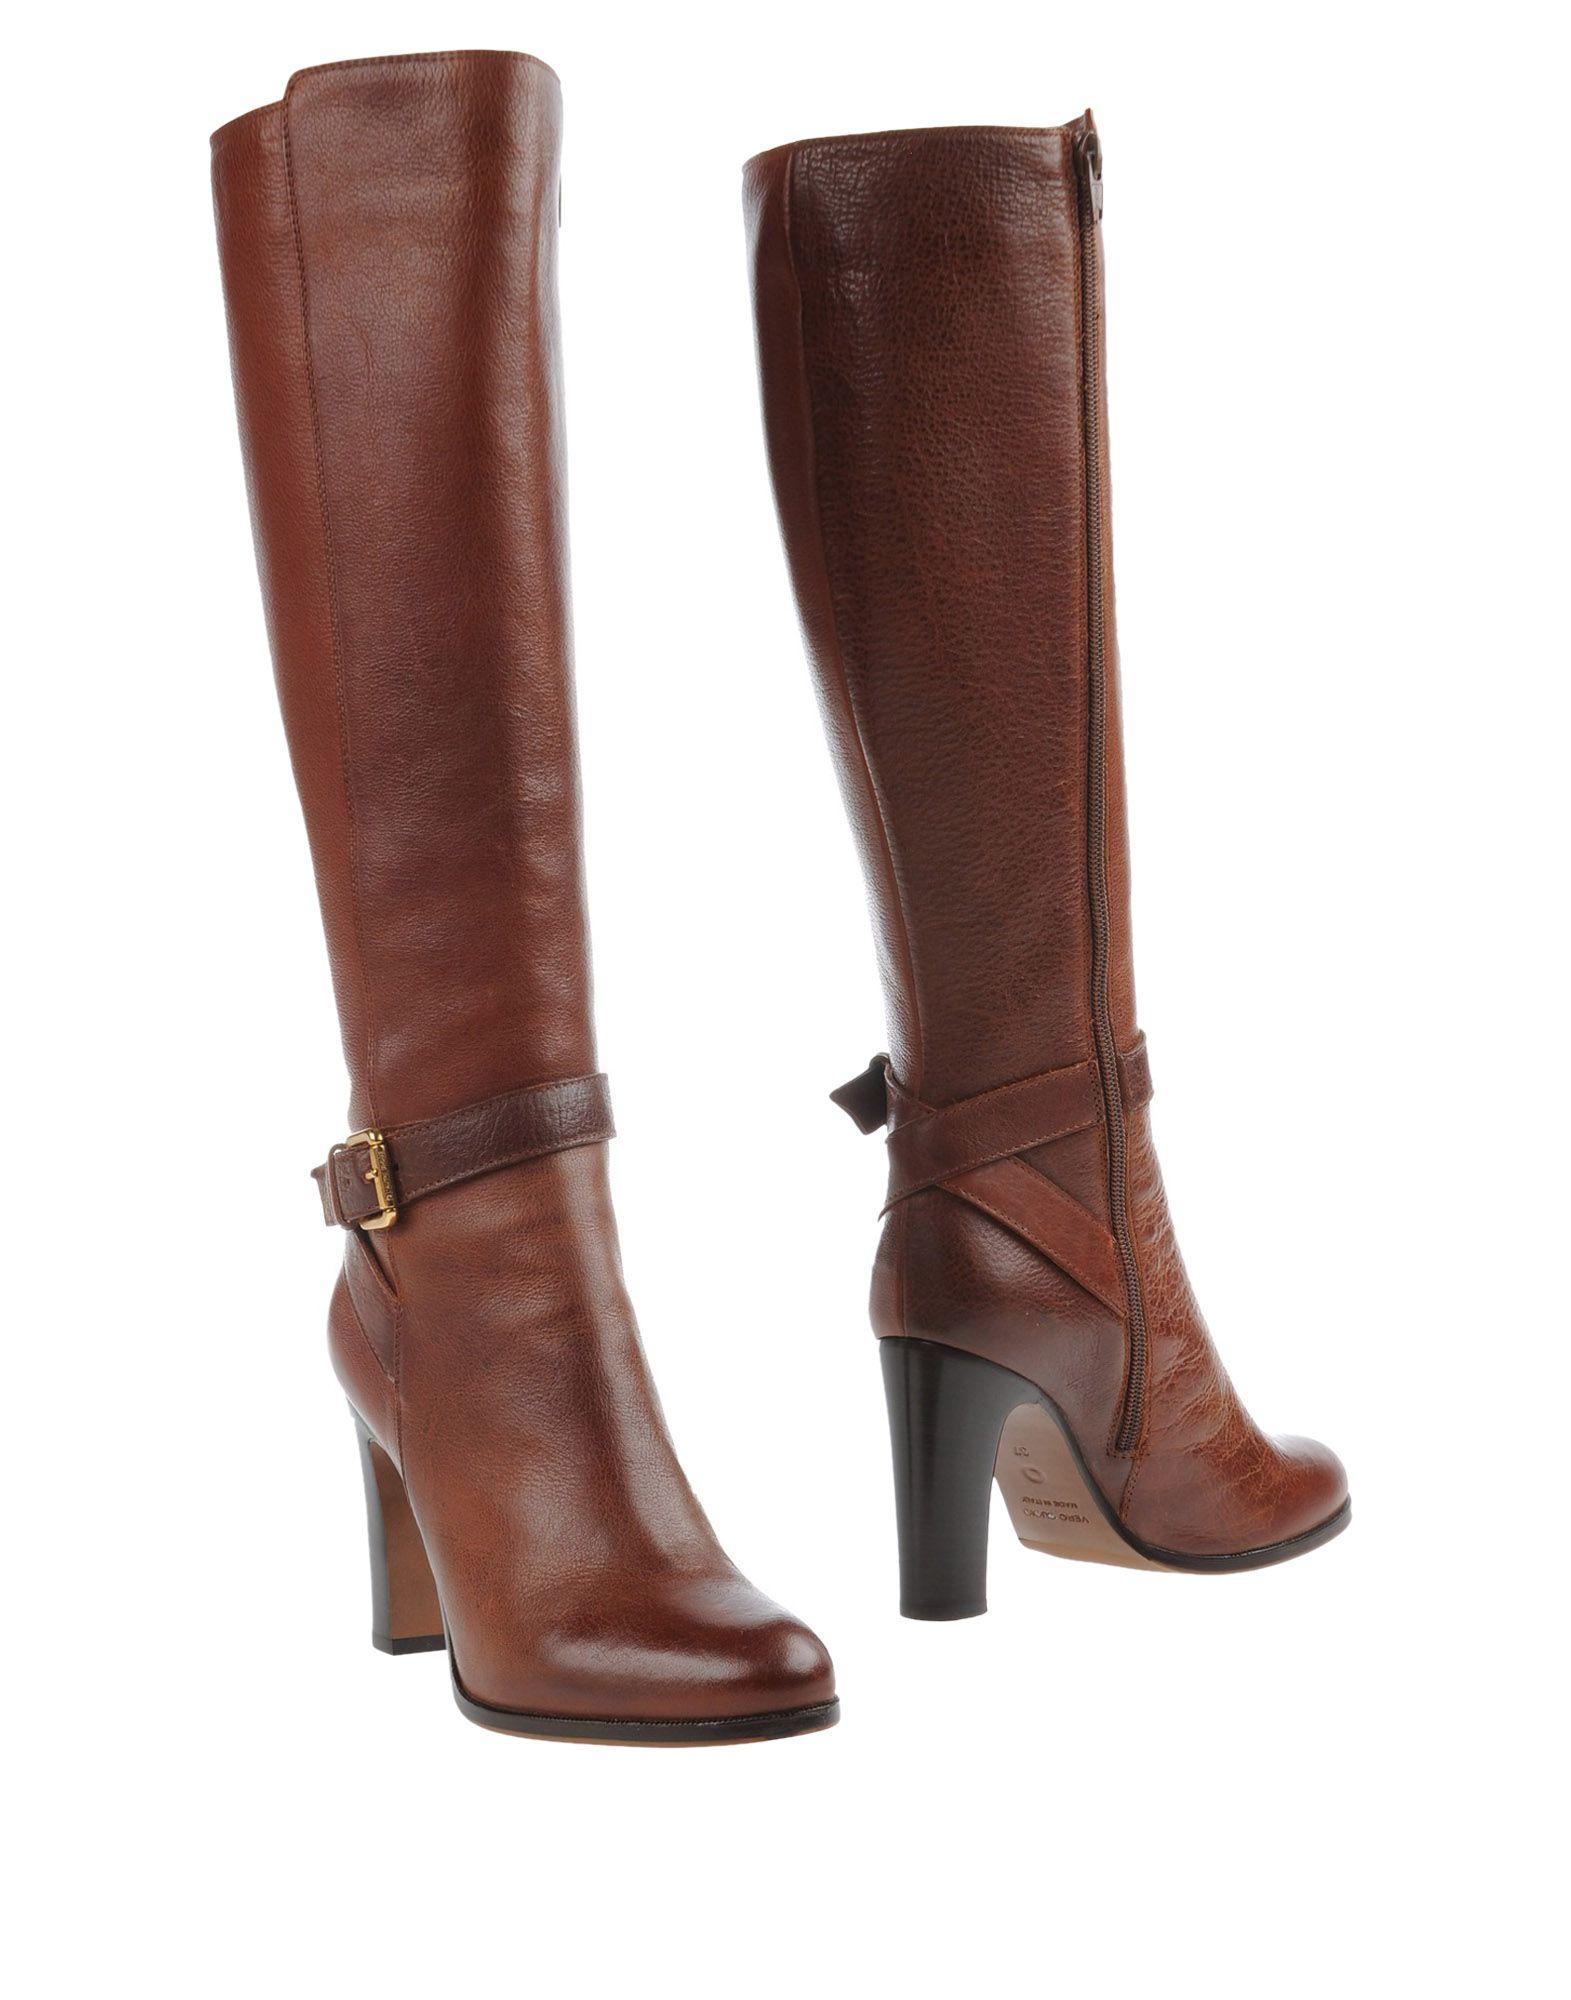 l 39 autre chose boots in brown lyst. Black Bedroom Furniture Sets. Home Design Ideas